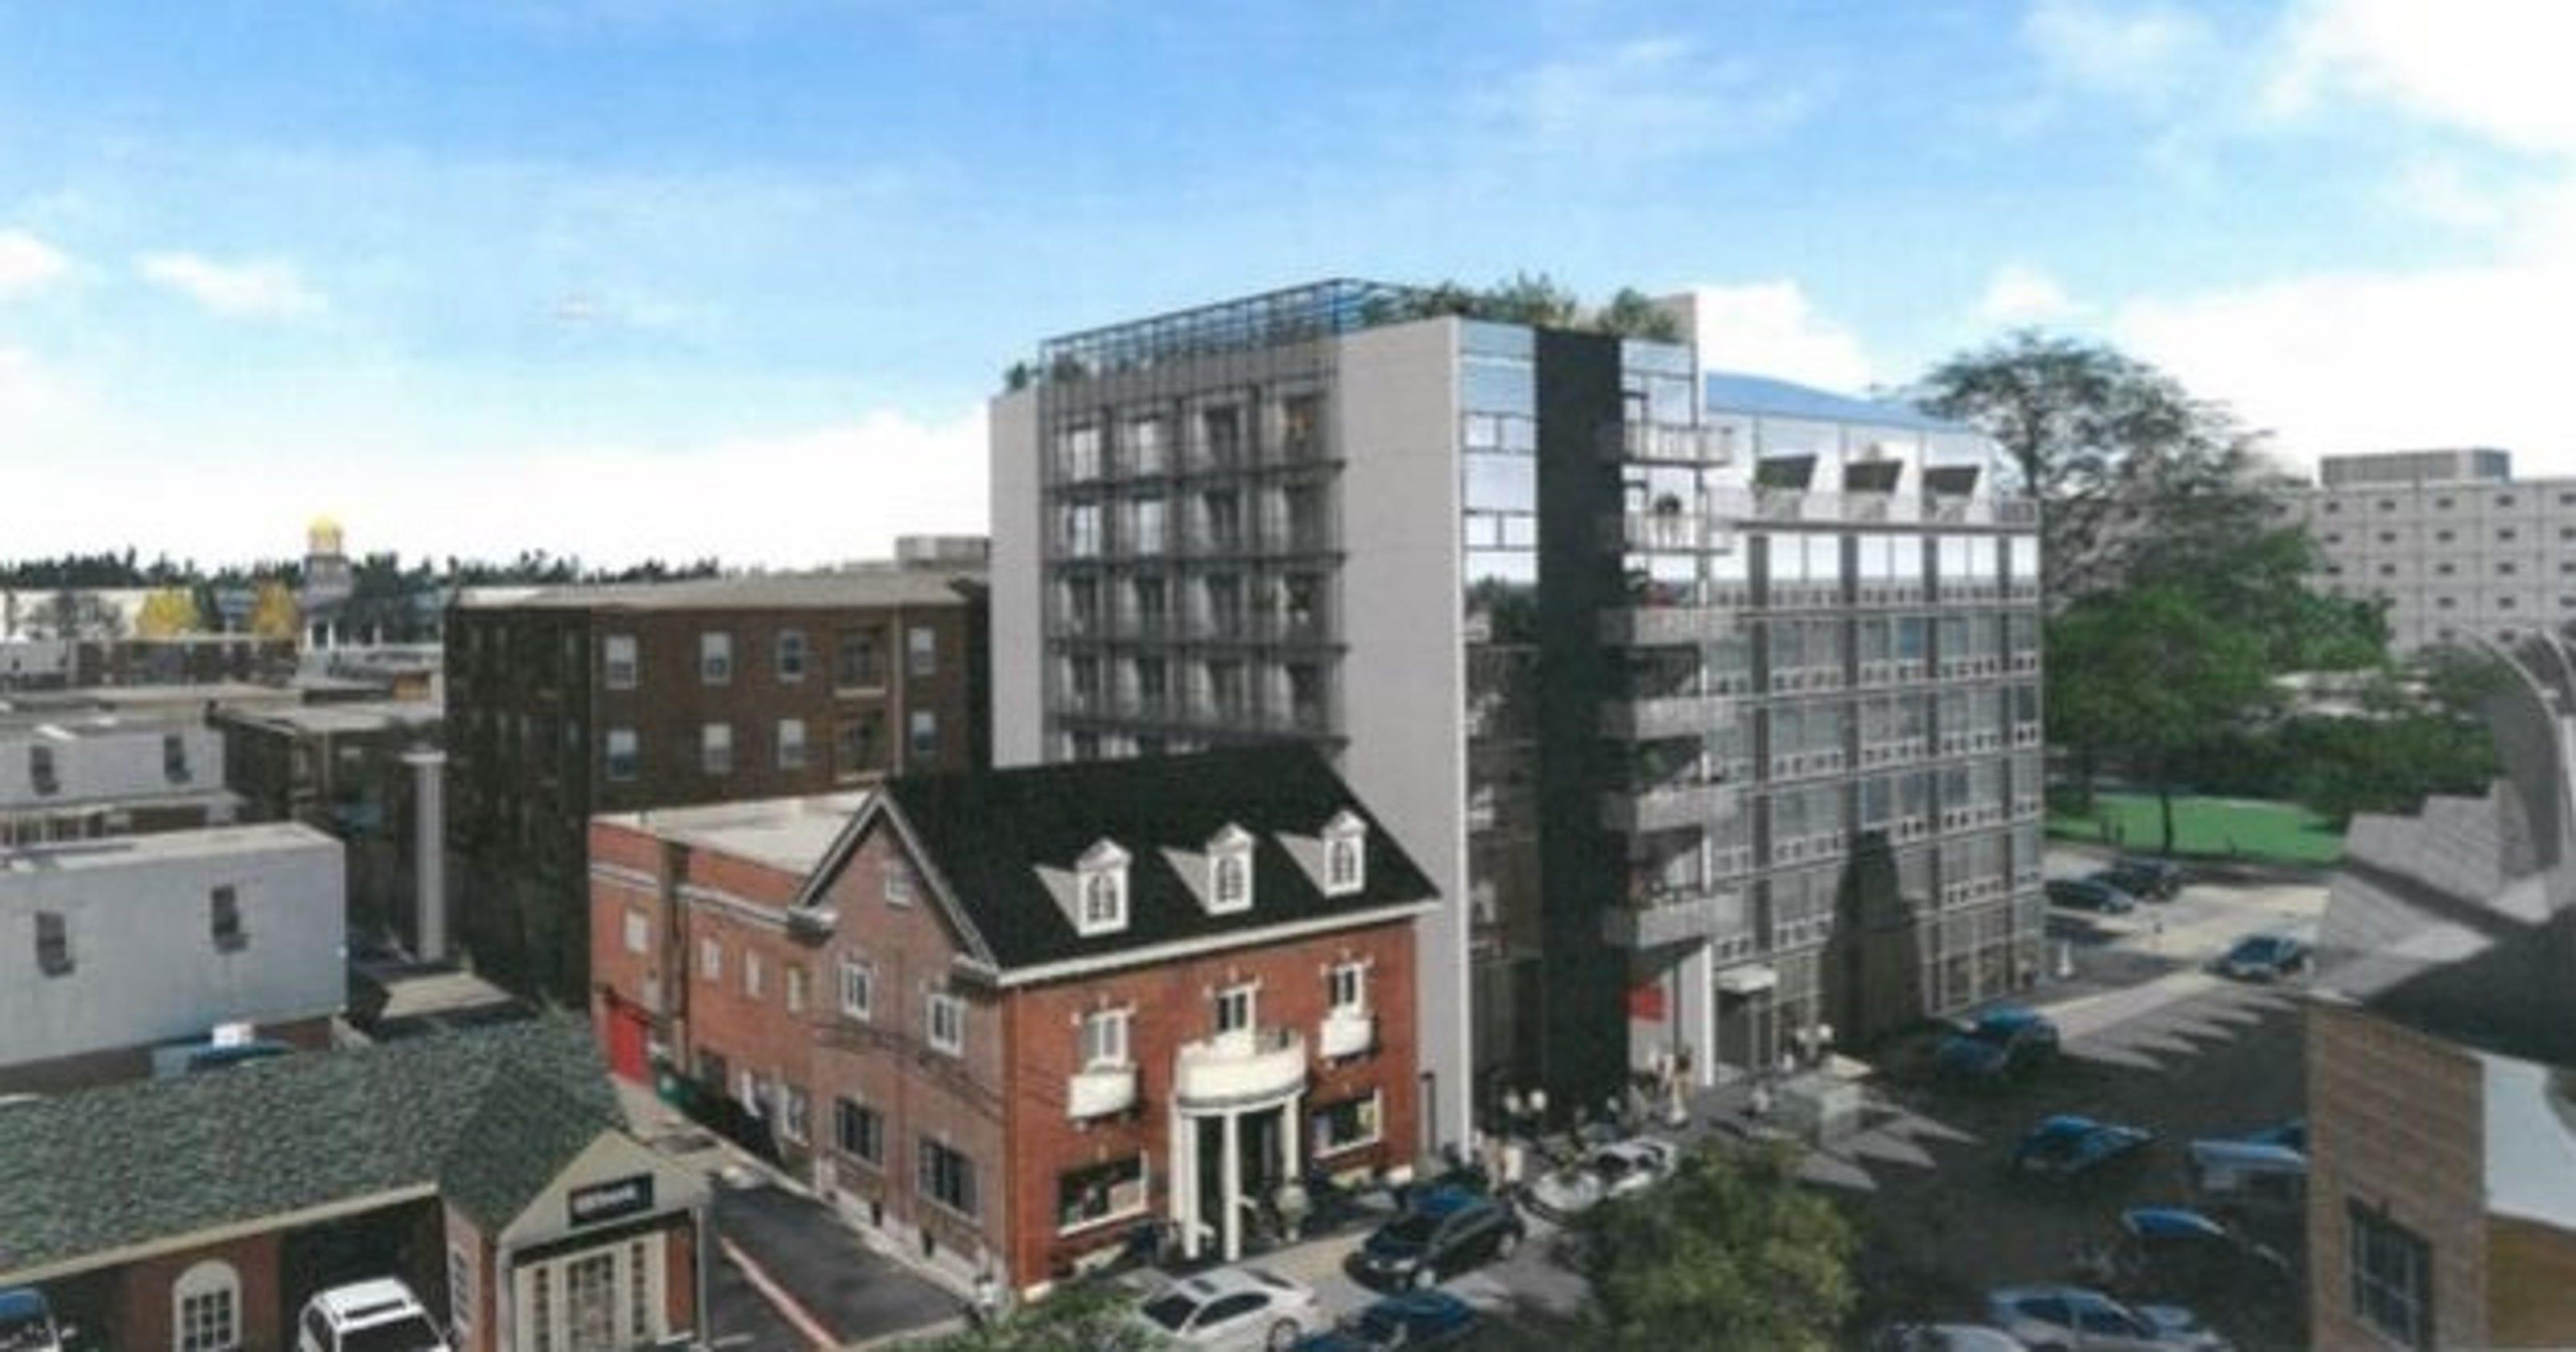 Iowa City commits $36K to downtown workforce housing